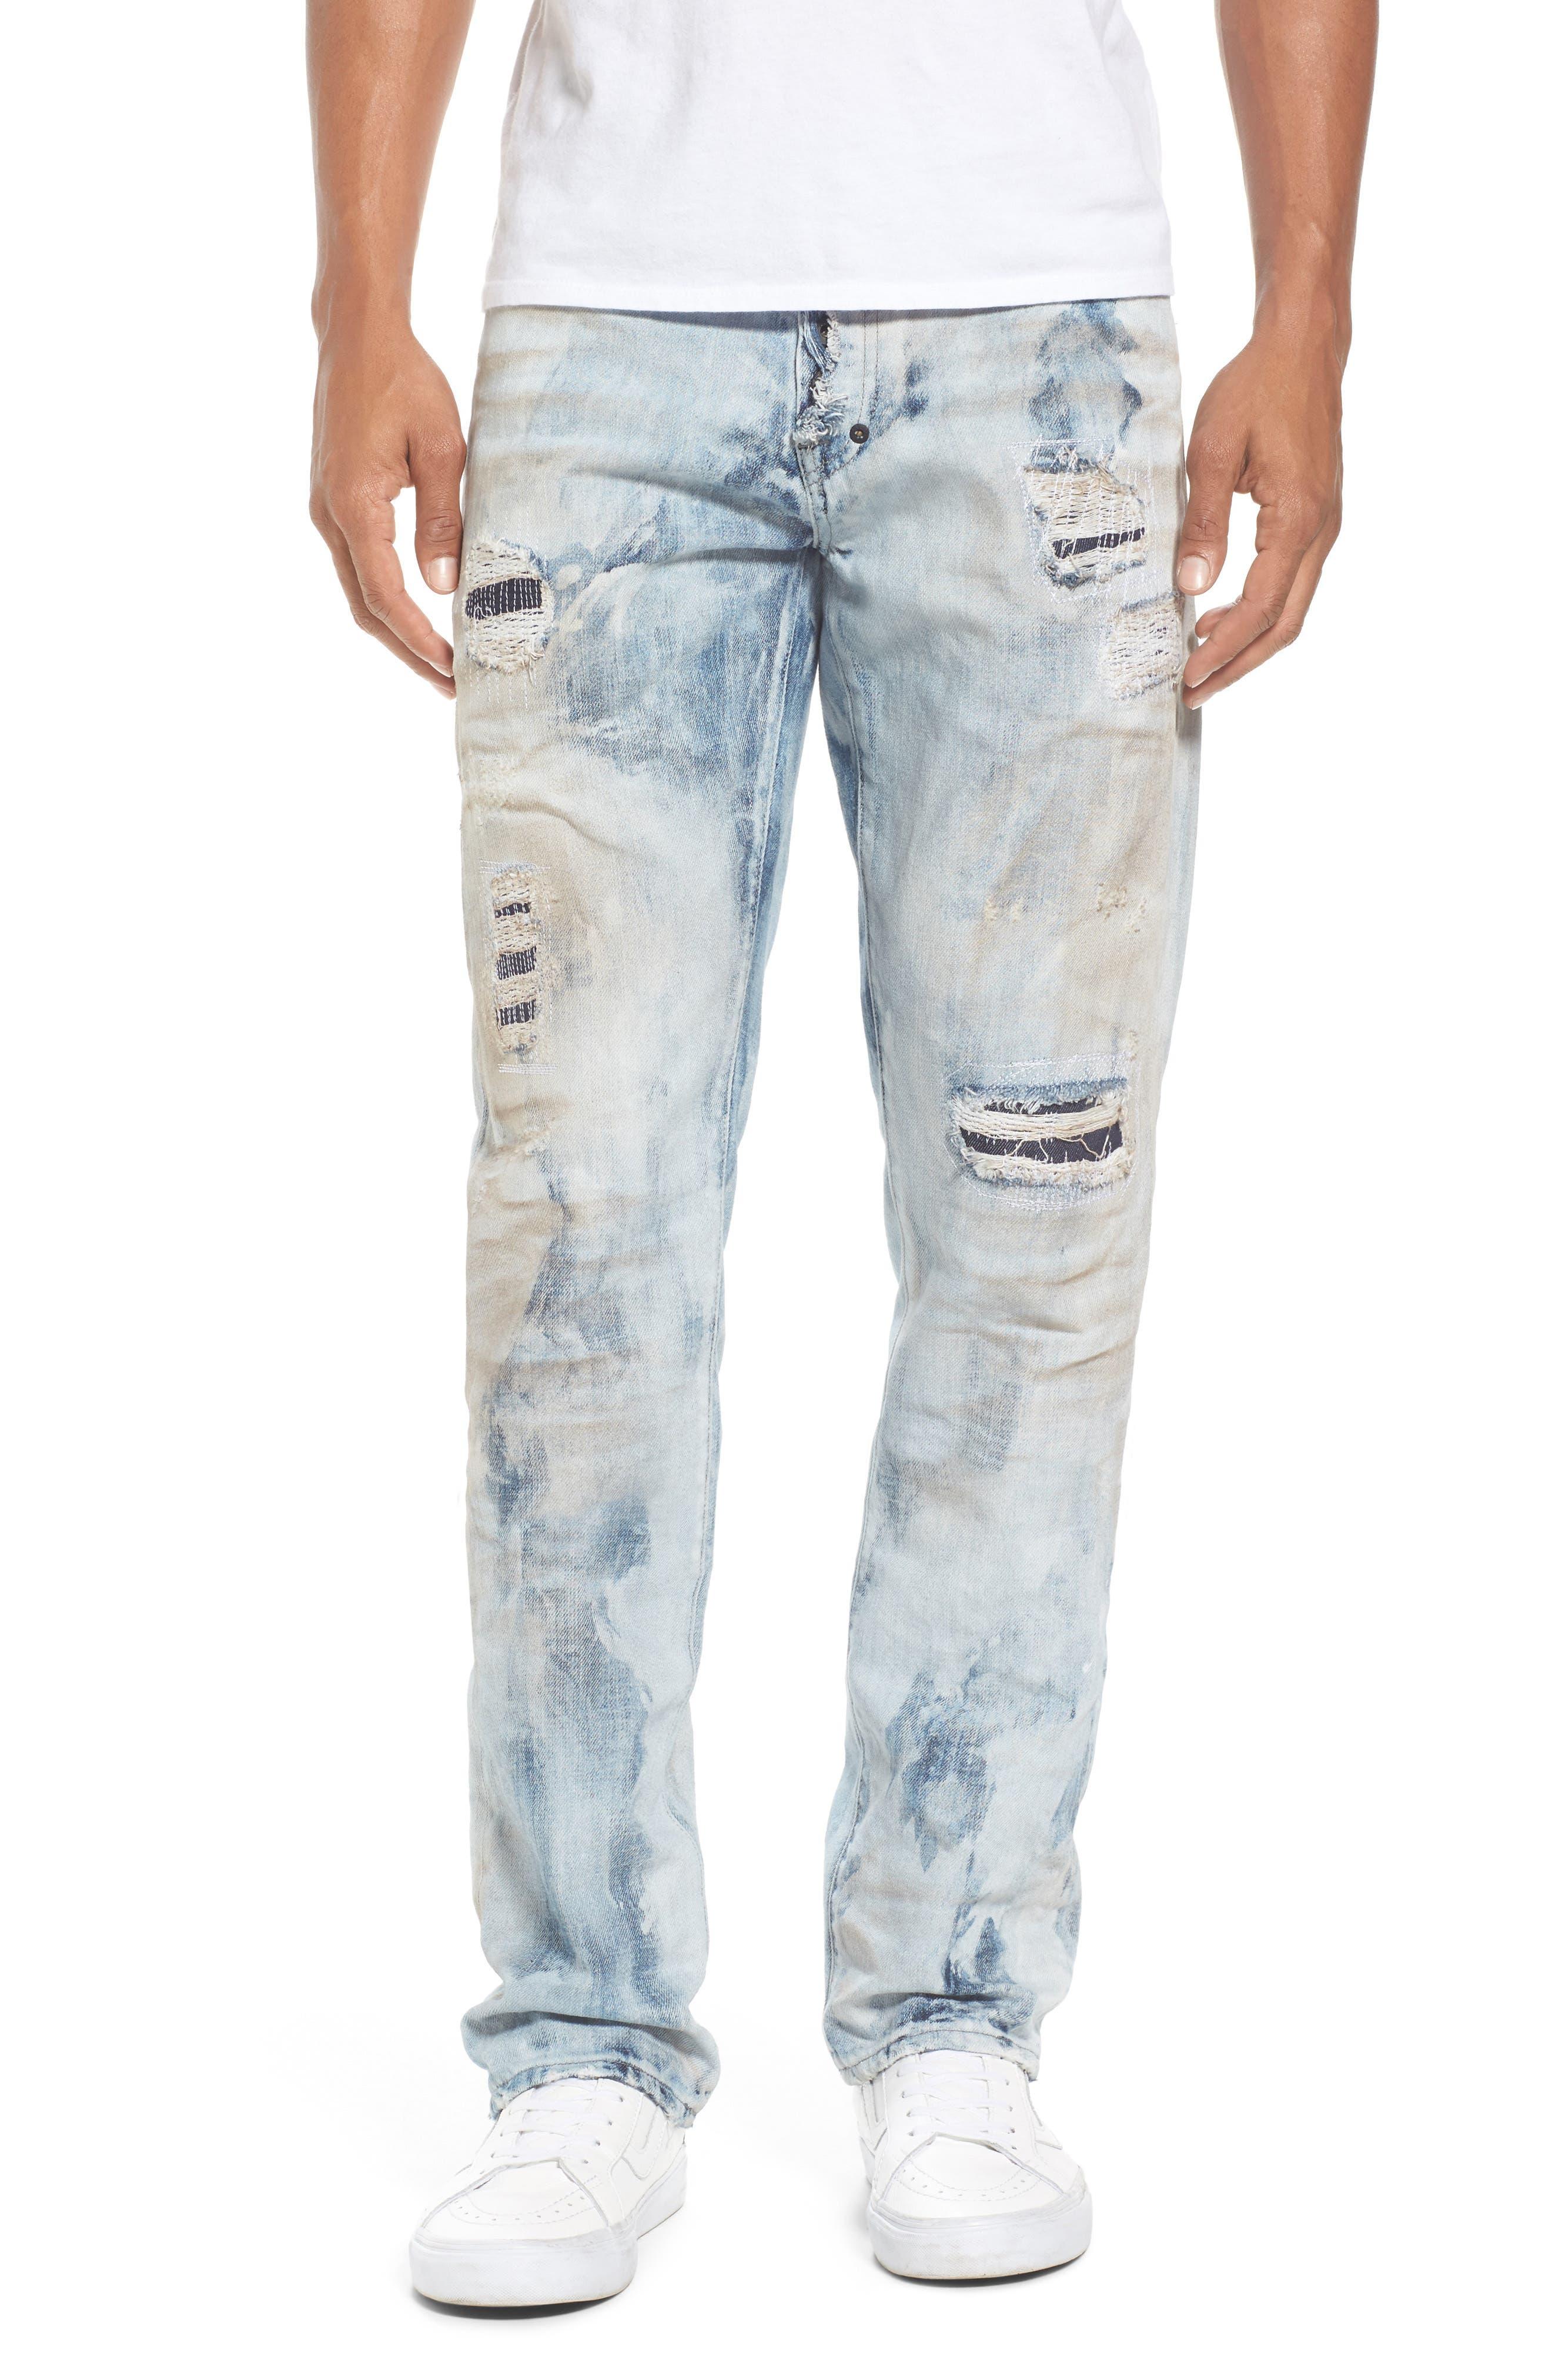 Demon Slim Straight Leg Jeans,                             Main thumbnail 1, color,                             COZY LIGHT WASH